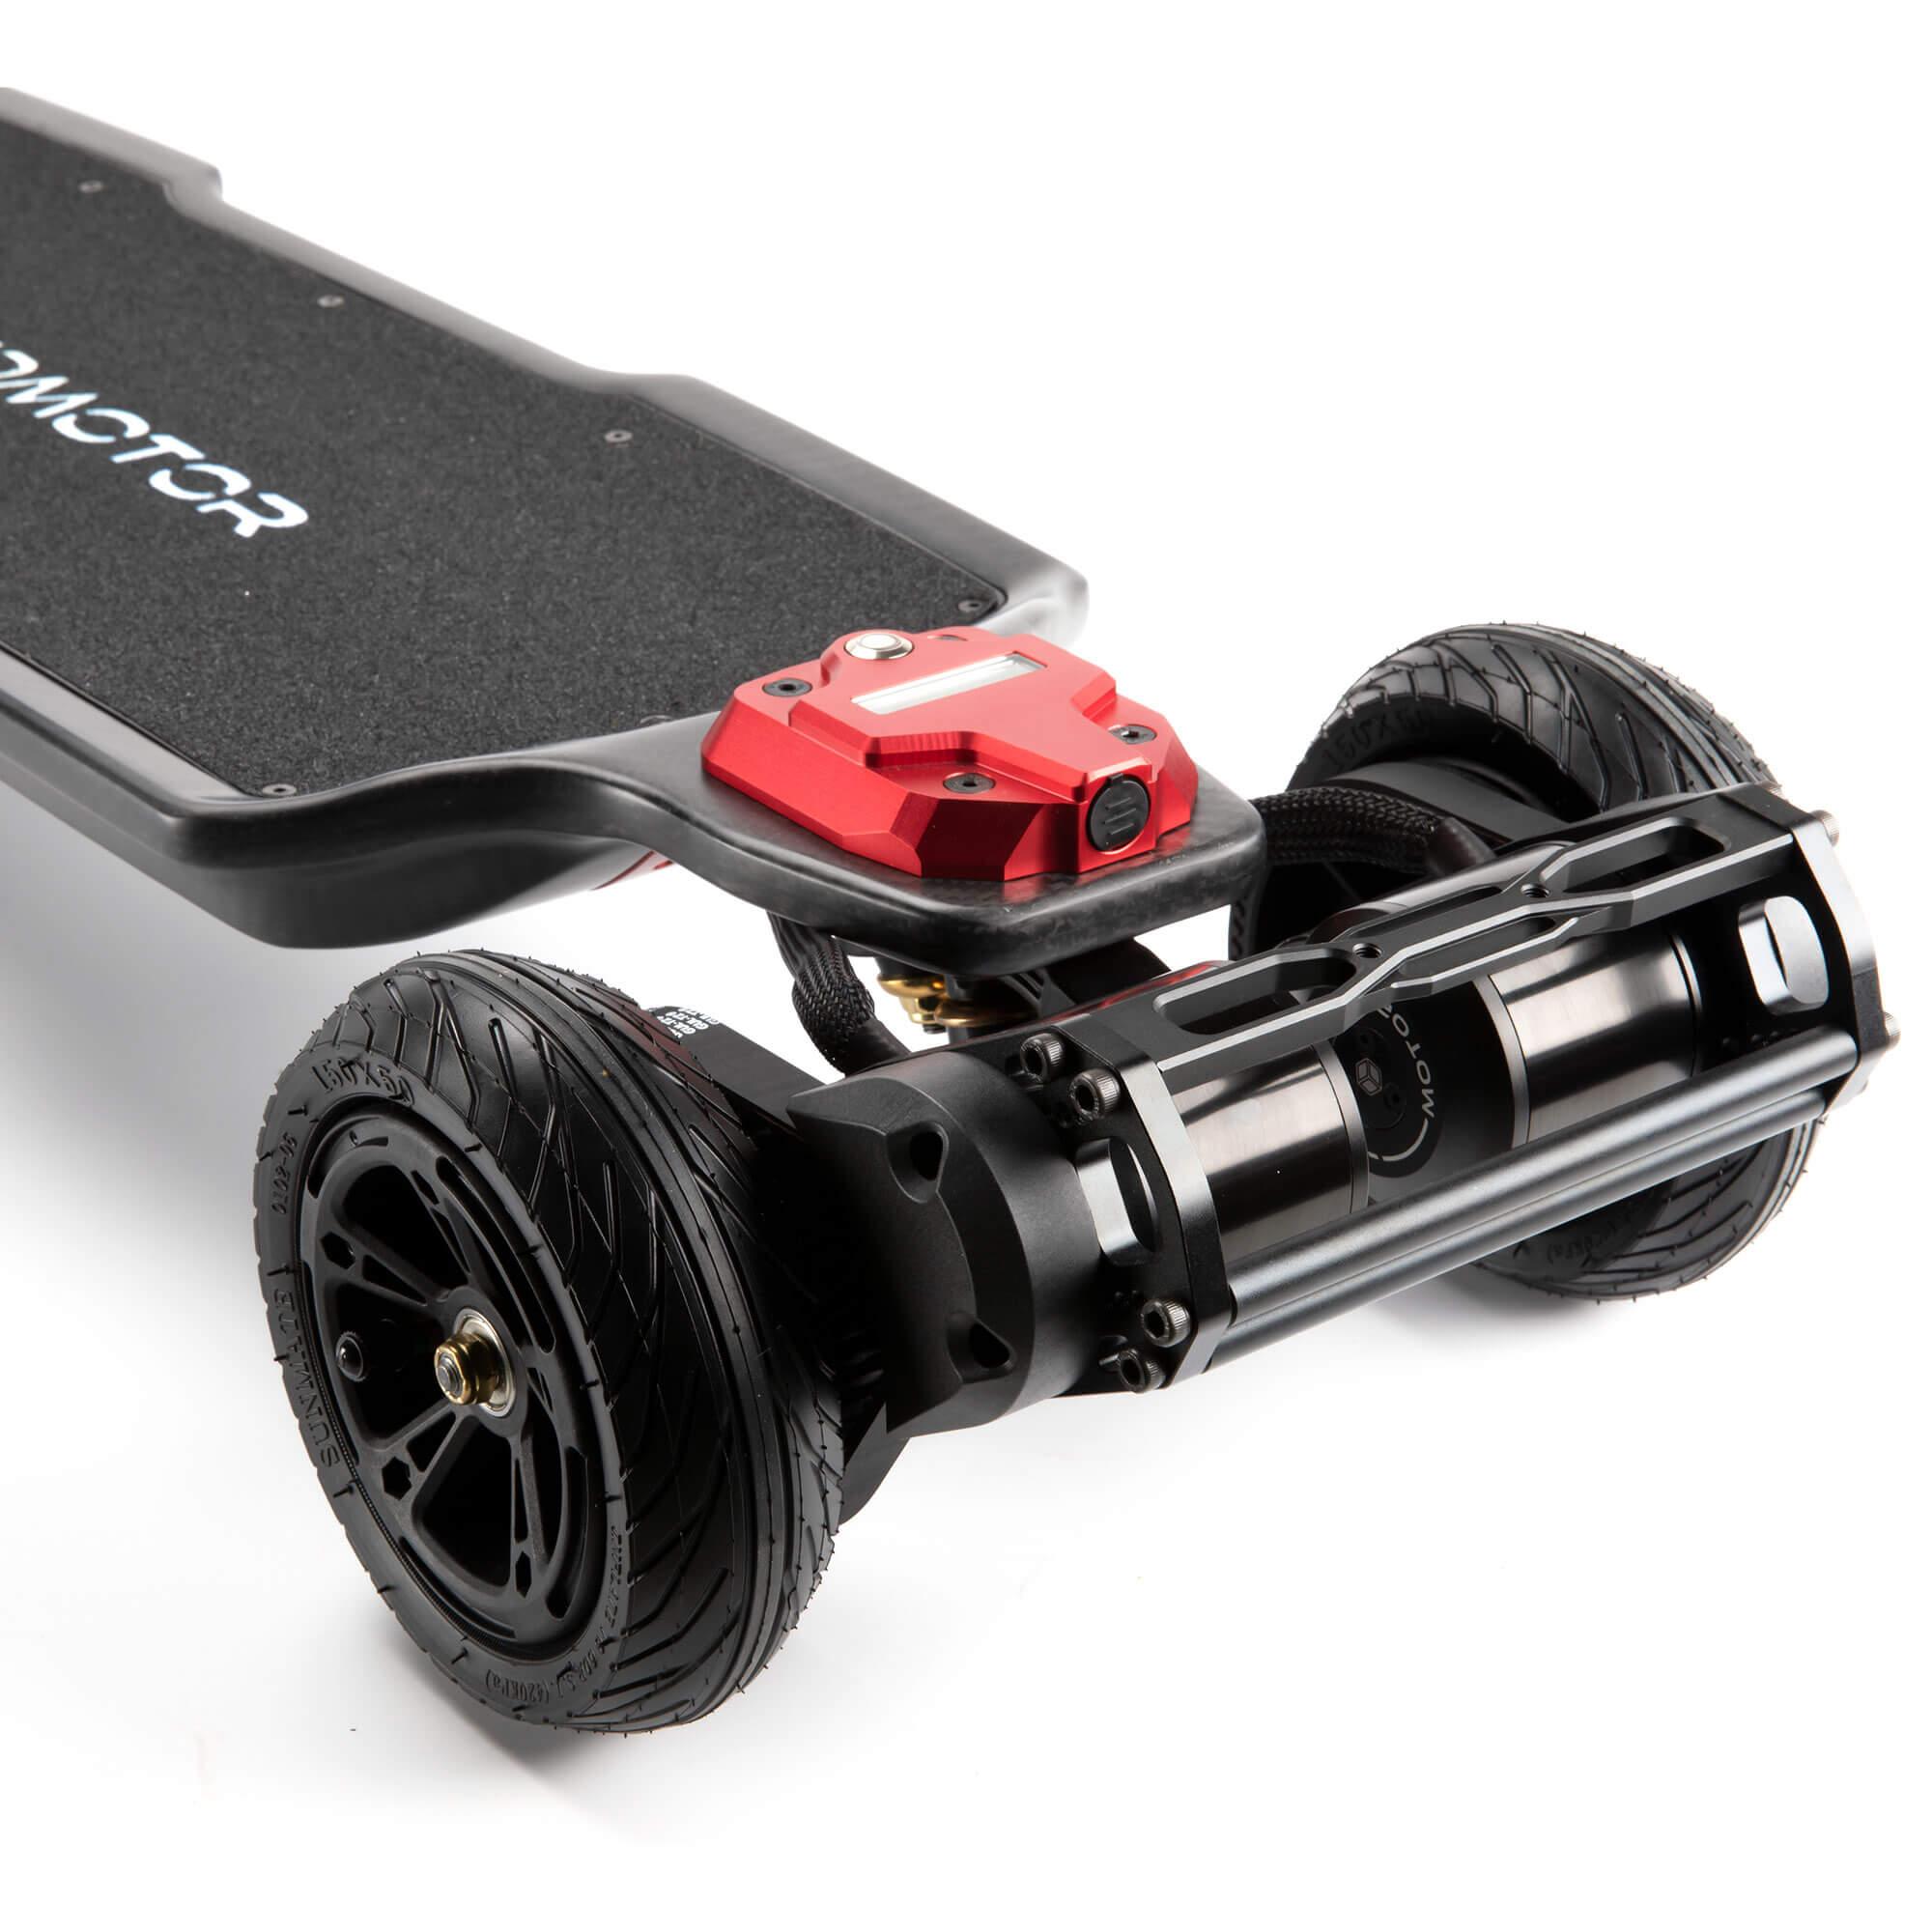 Electric belt drive skateboard - boundmotor FLASH AT - 190s